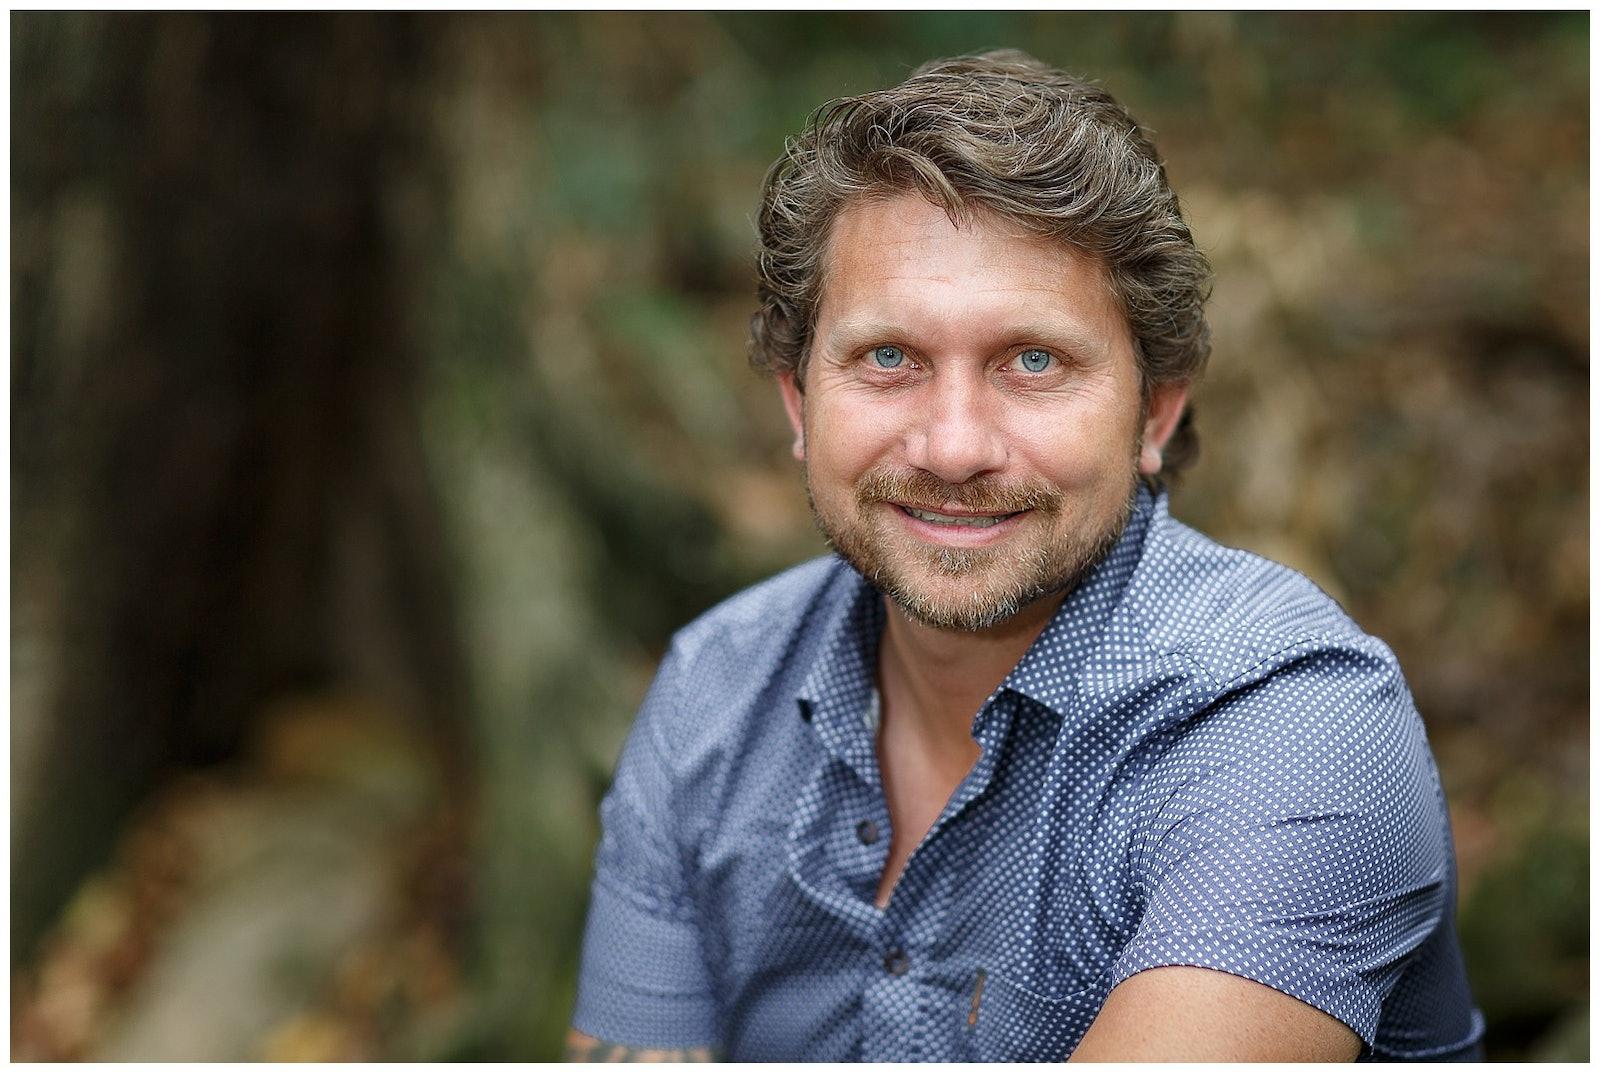 Awesome Brisbane Branding Headshot Photographer for Men_0021